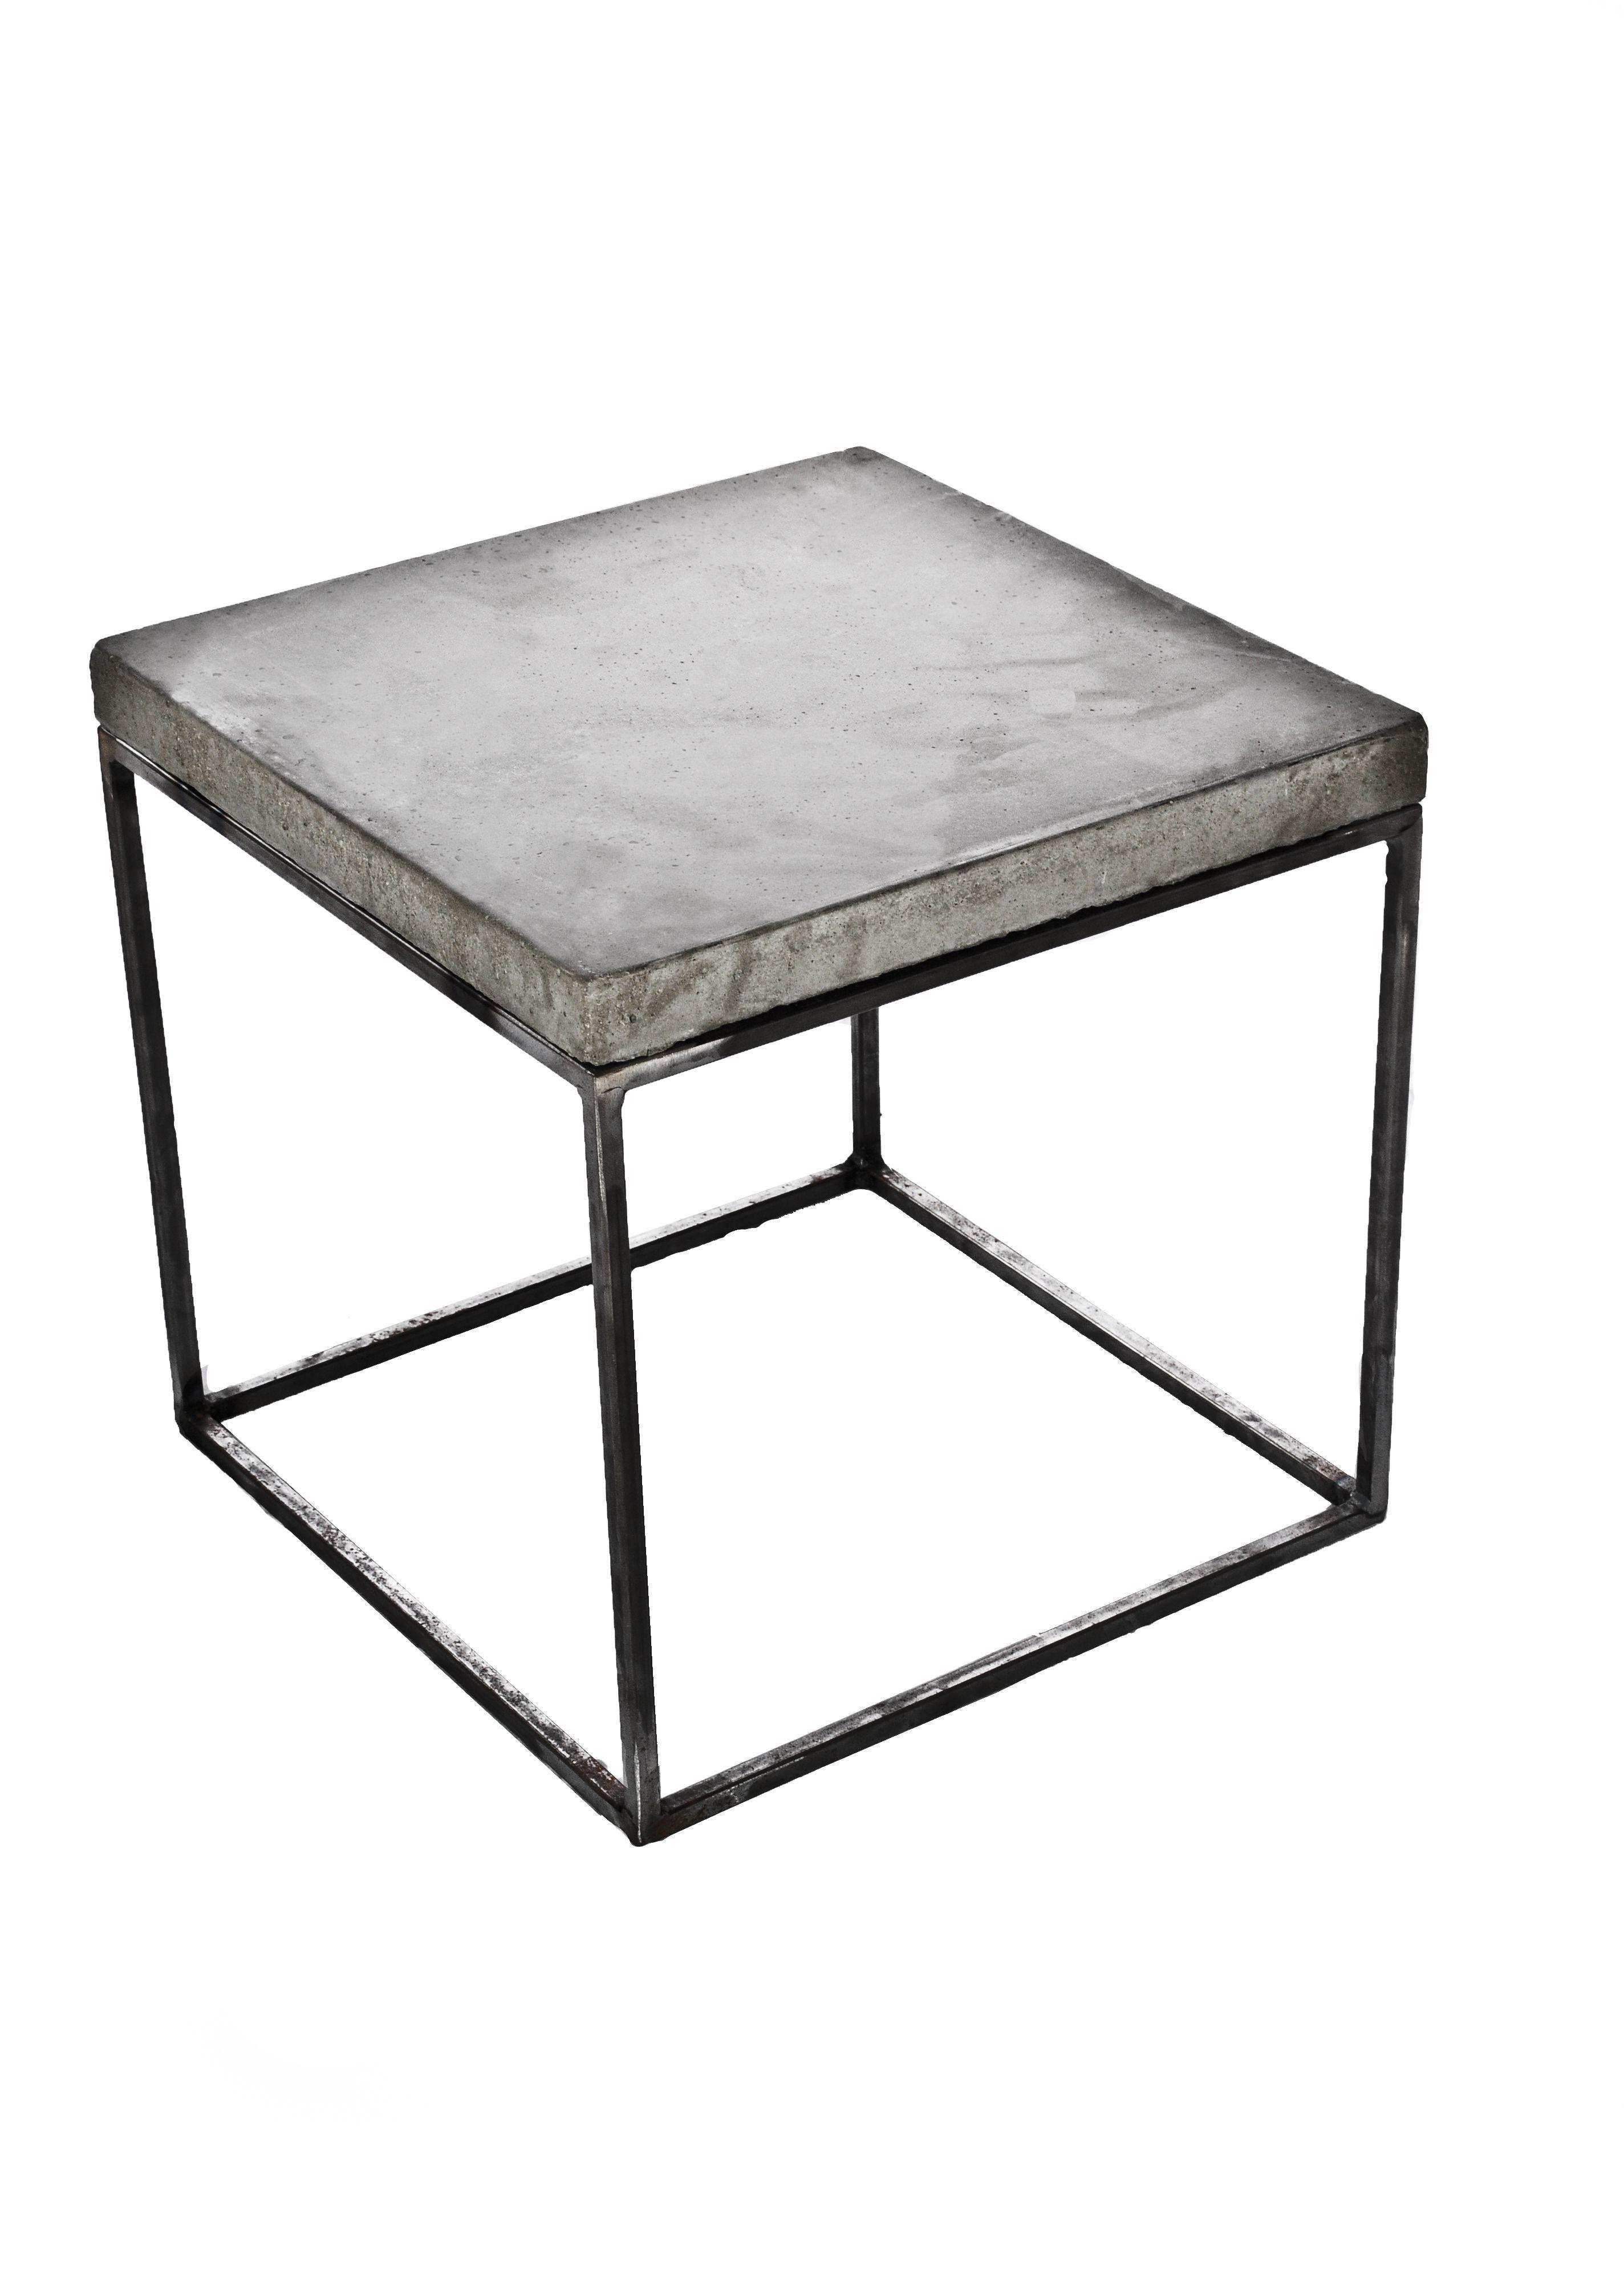 Oakland En 2019 Patrick Cain Designs Cube Side Table